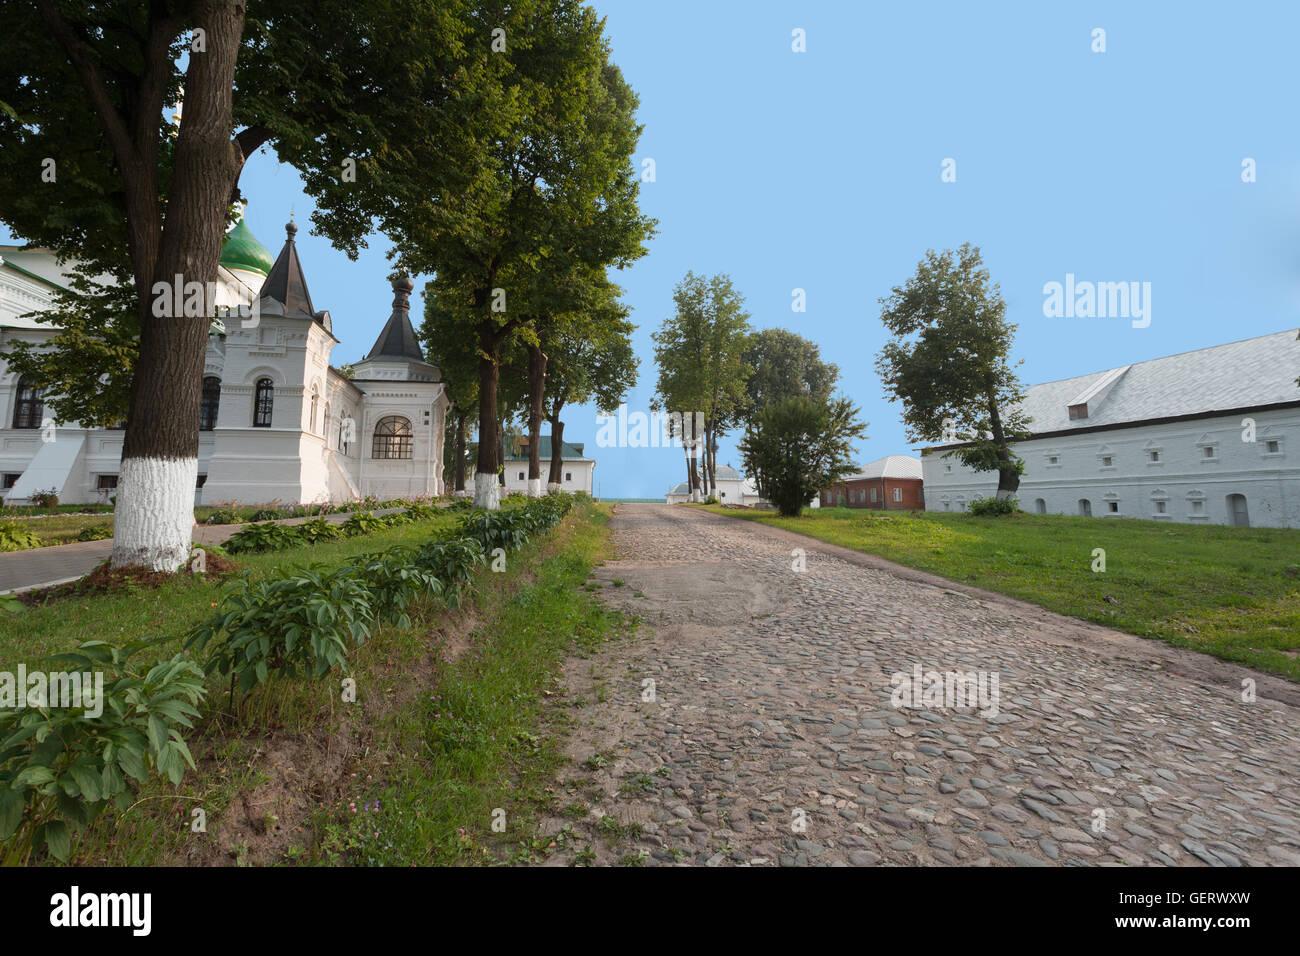 stone monastery road - Stock Image